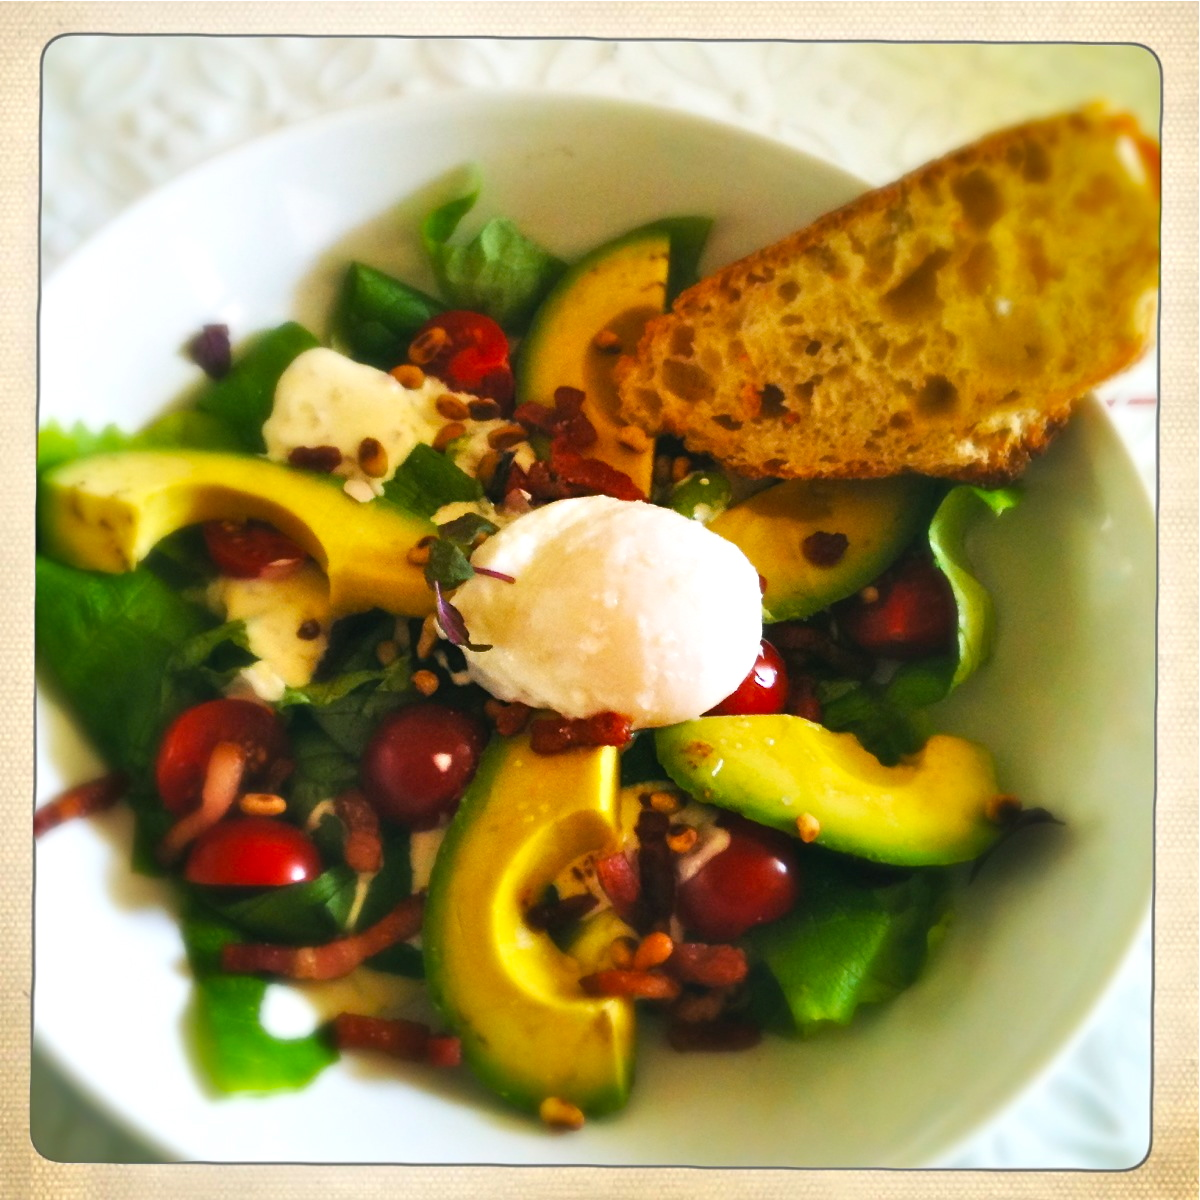 salade avocado gepocheerd ei